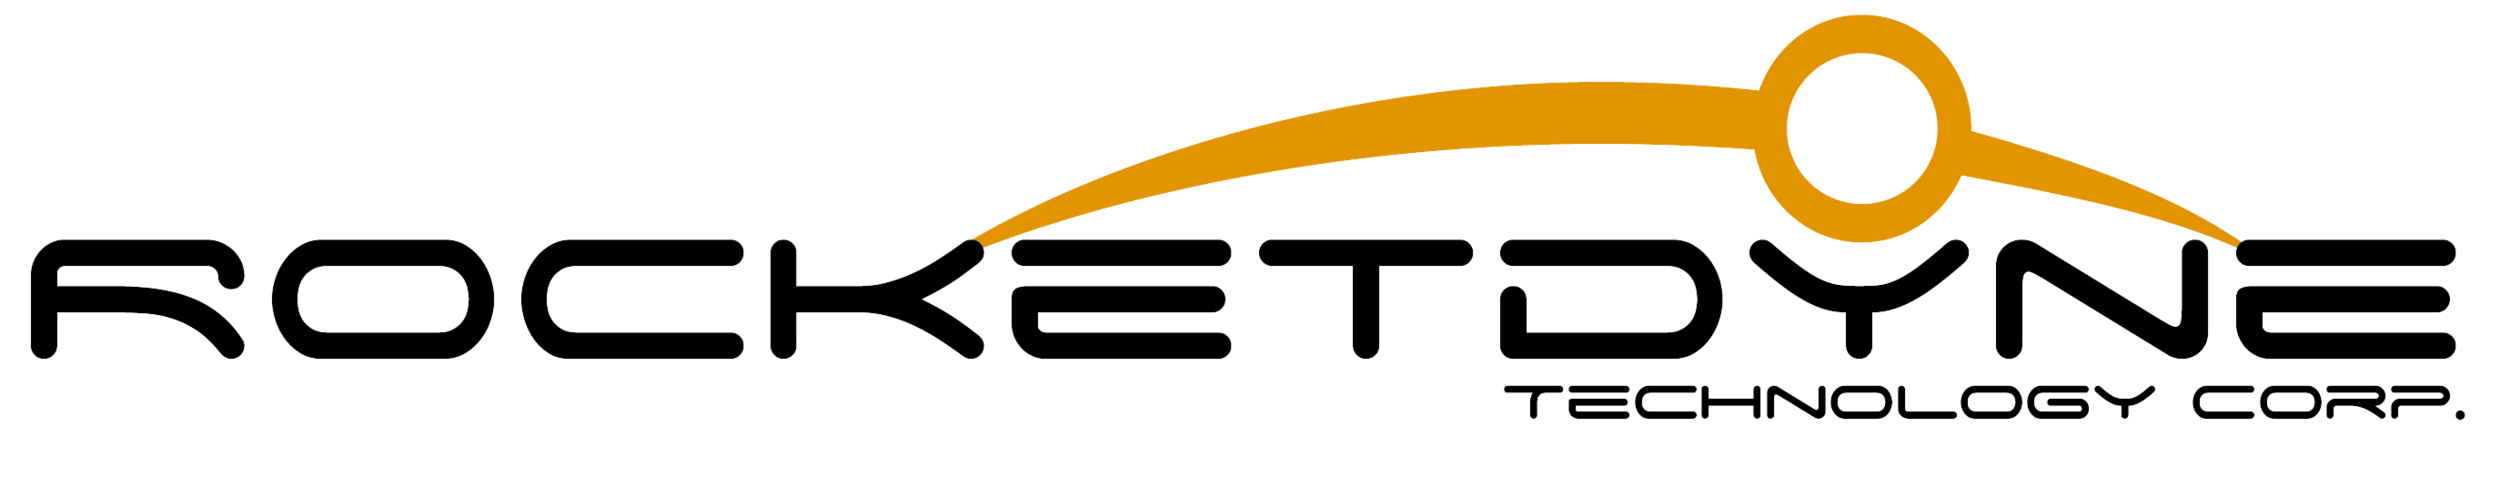 Rocketdyne_logo[1].png